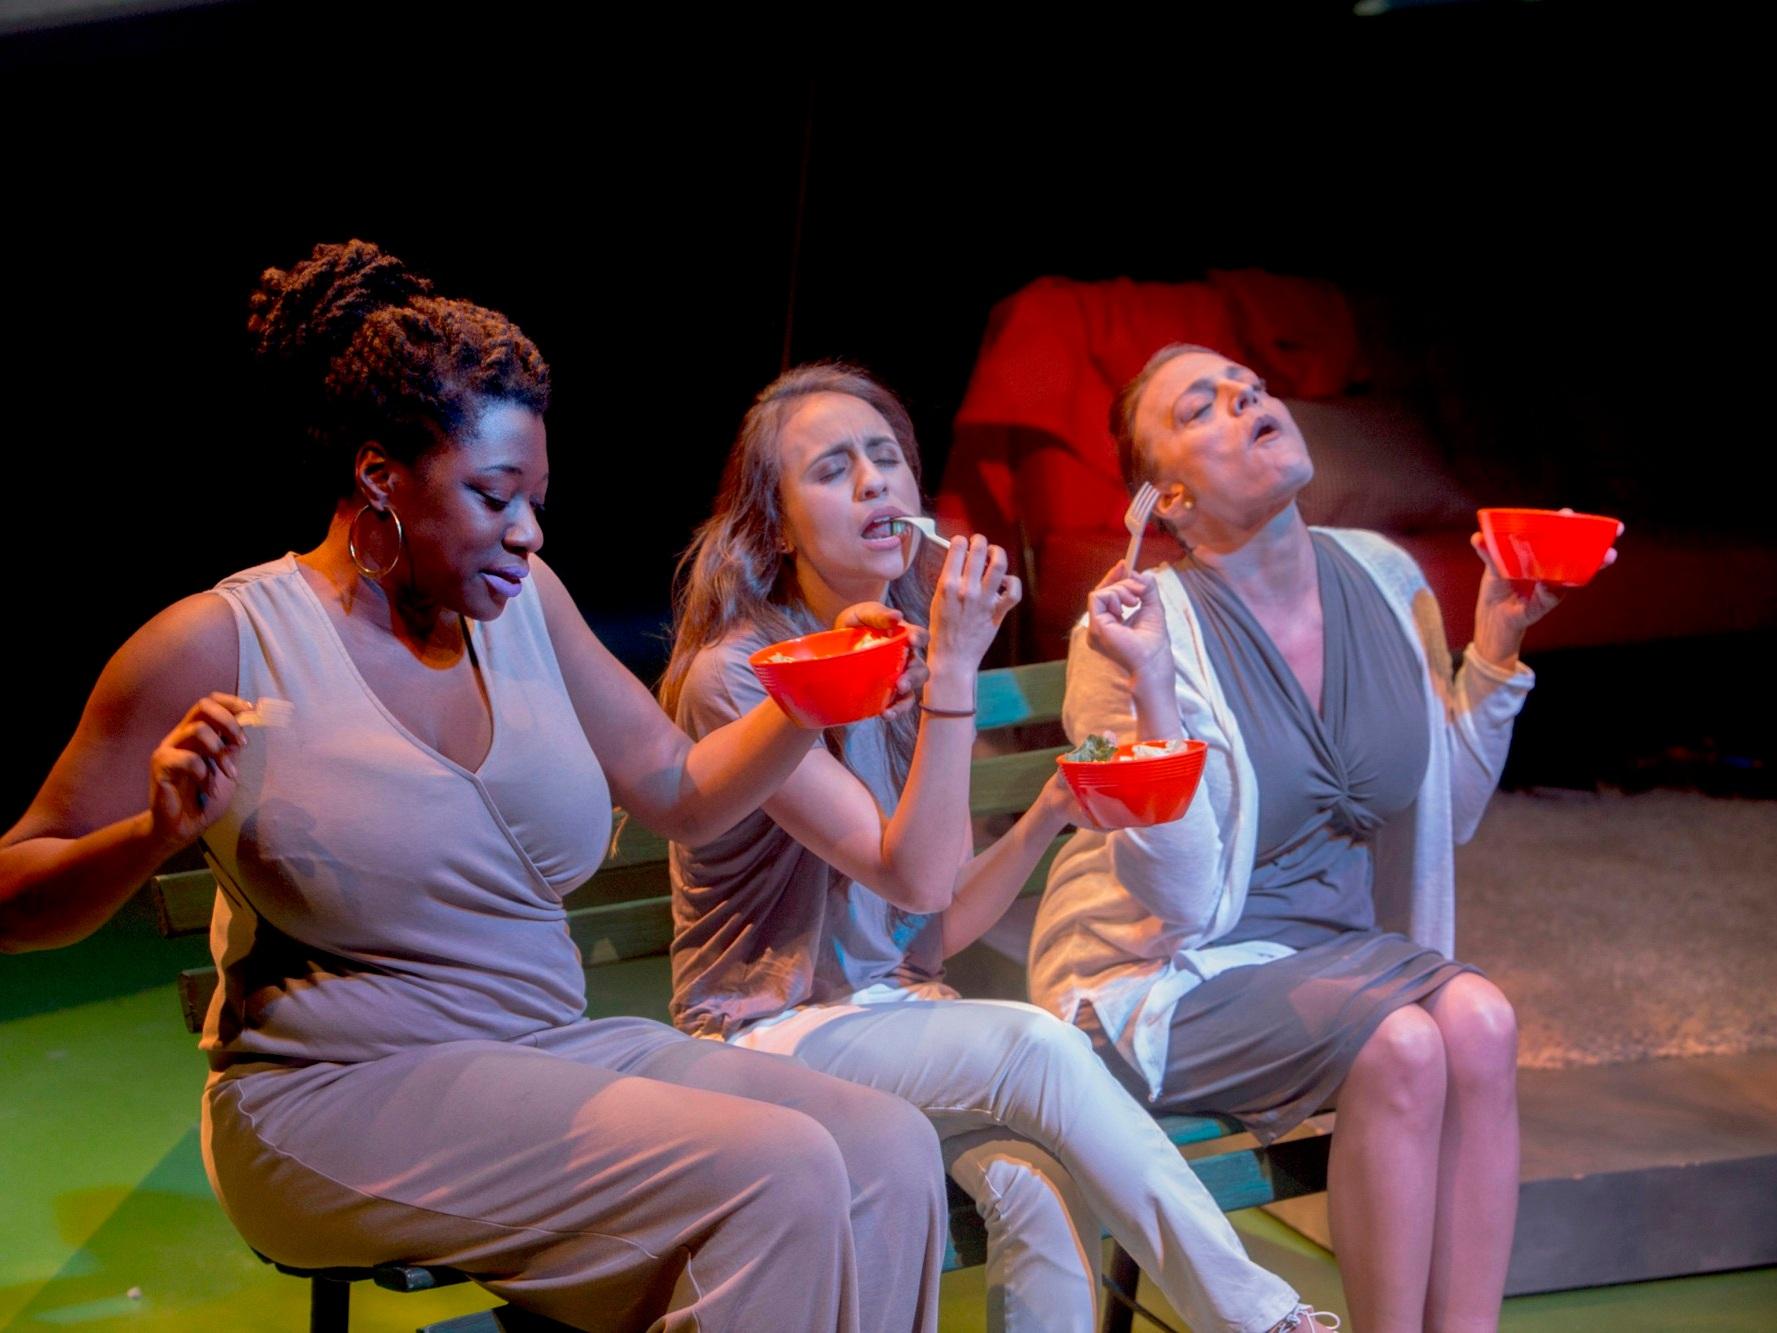 WOMEN LAUGHING ALONE WITH SALAD  Theater Wit   Echaka Agba, Daniella Pereira and Jennifer Engstrom/Photo: Charles Osgood